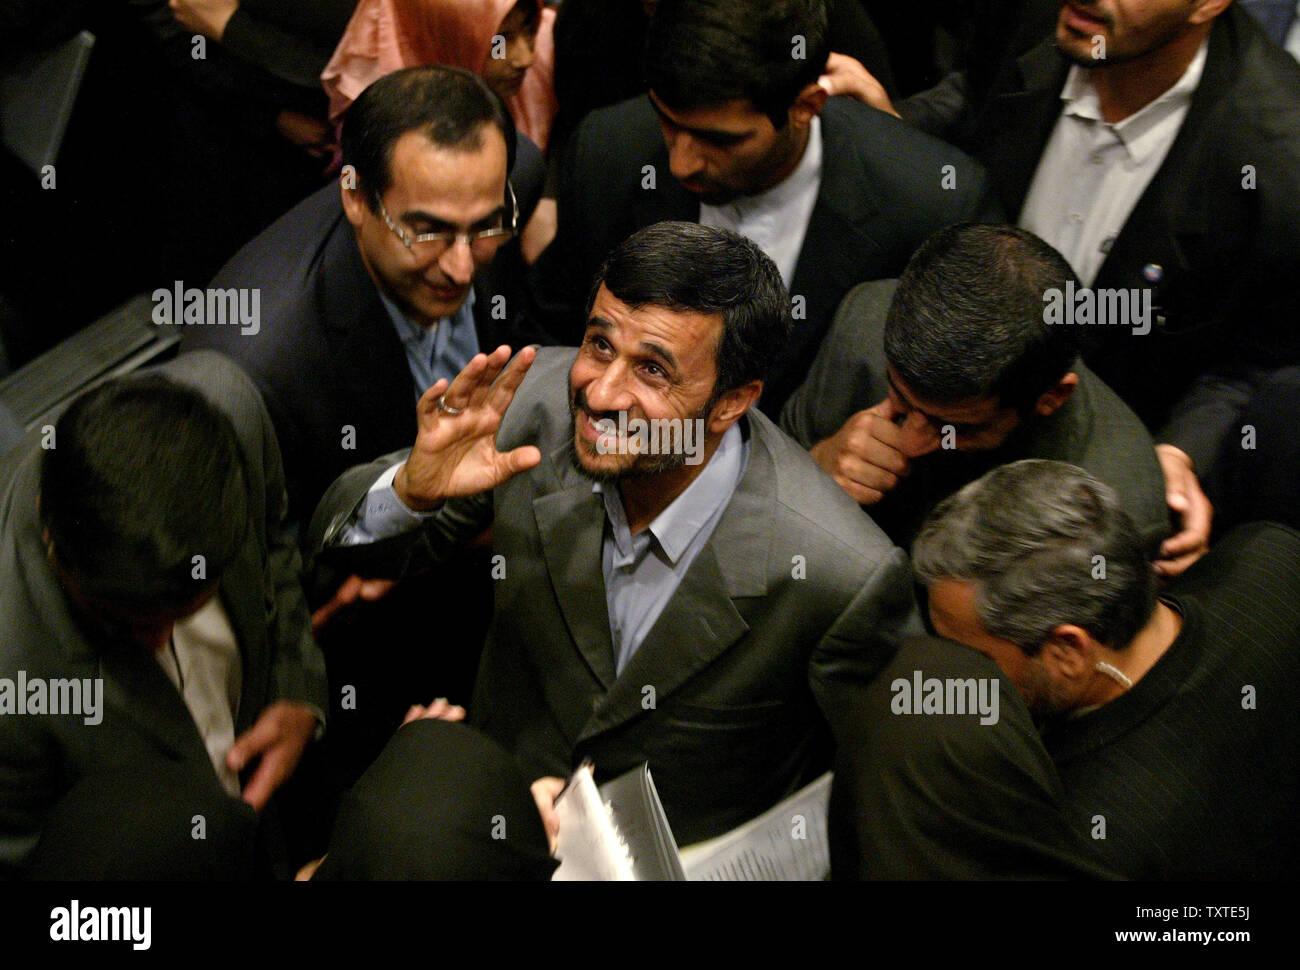 Iran's President Mahmoud Ahmadinejad (C) waves after his speech